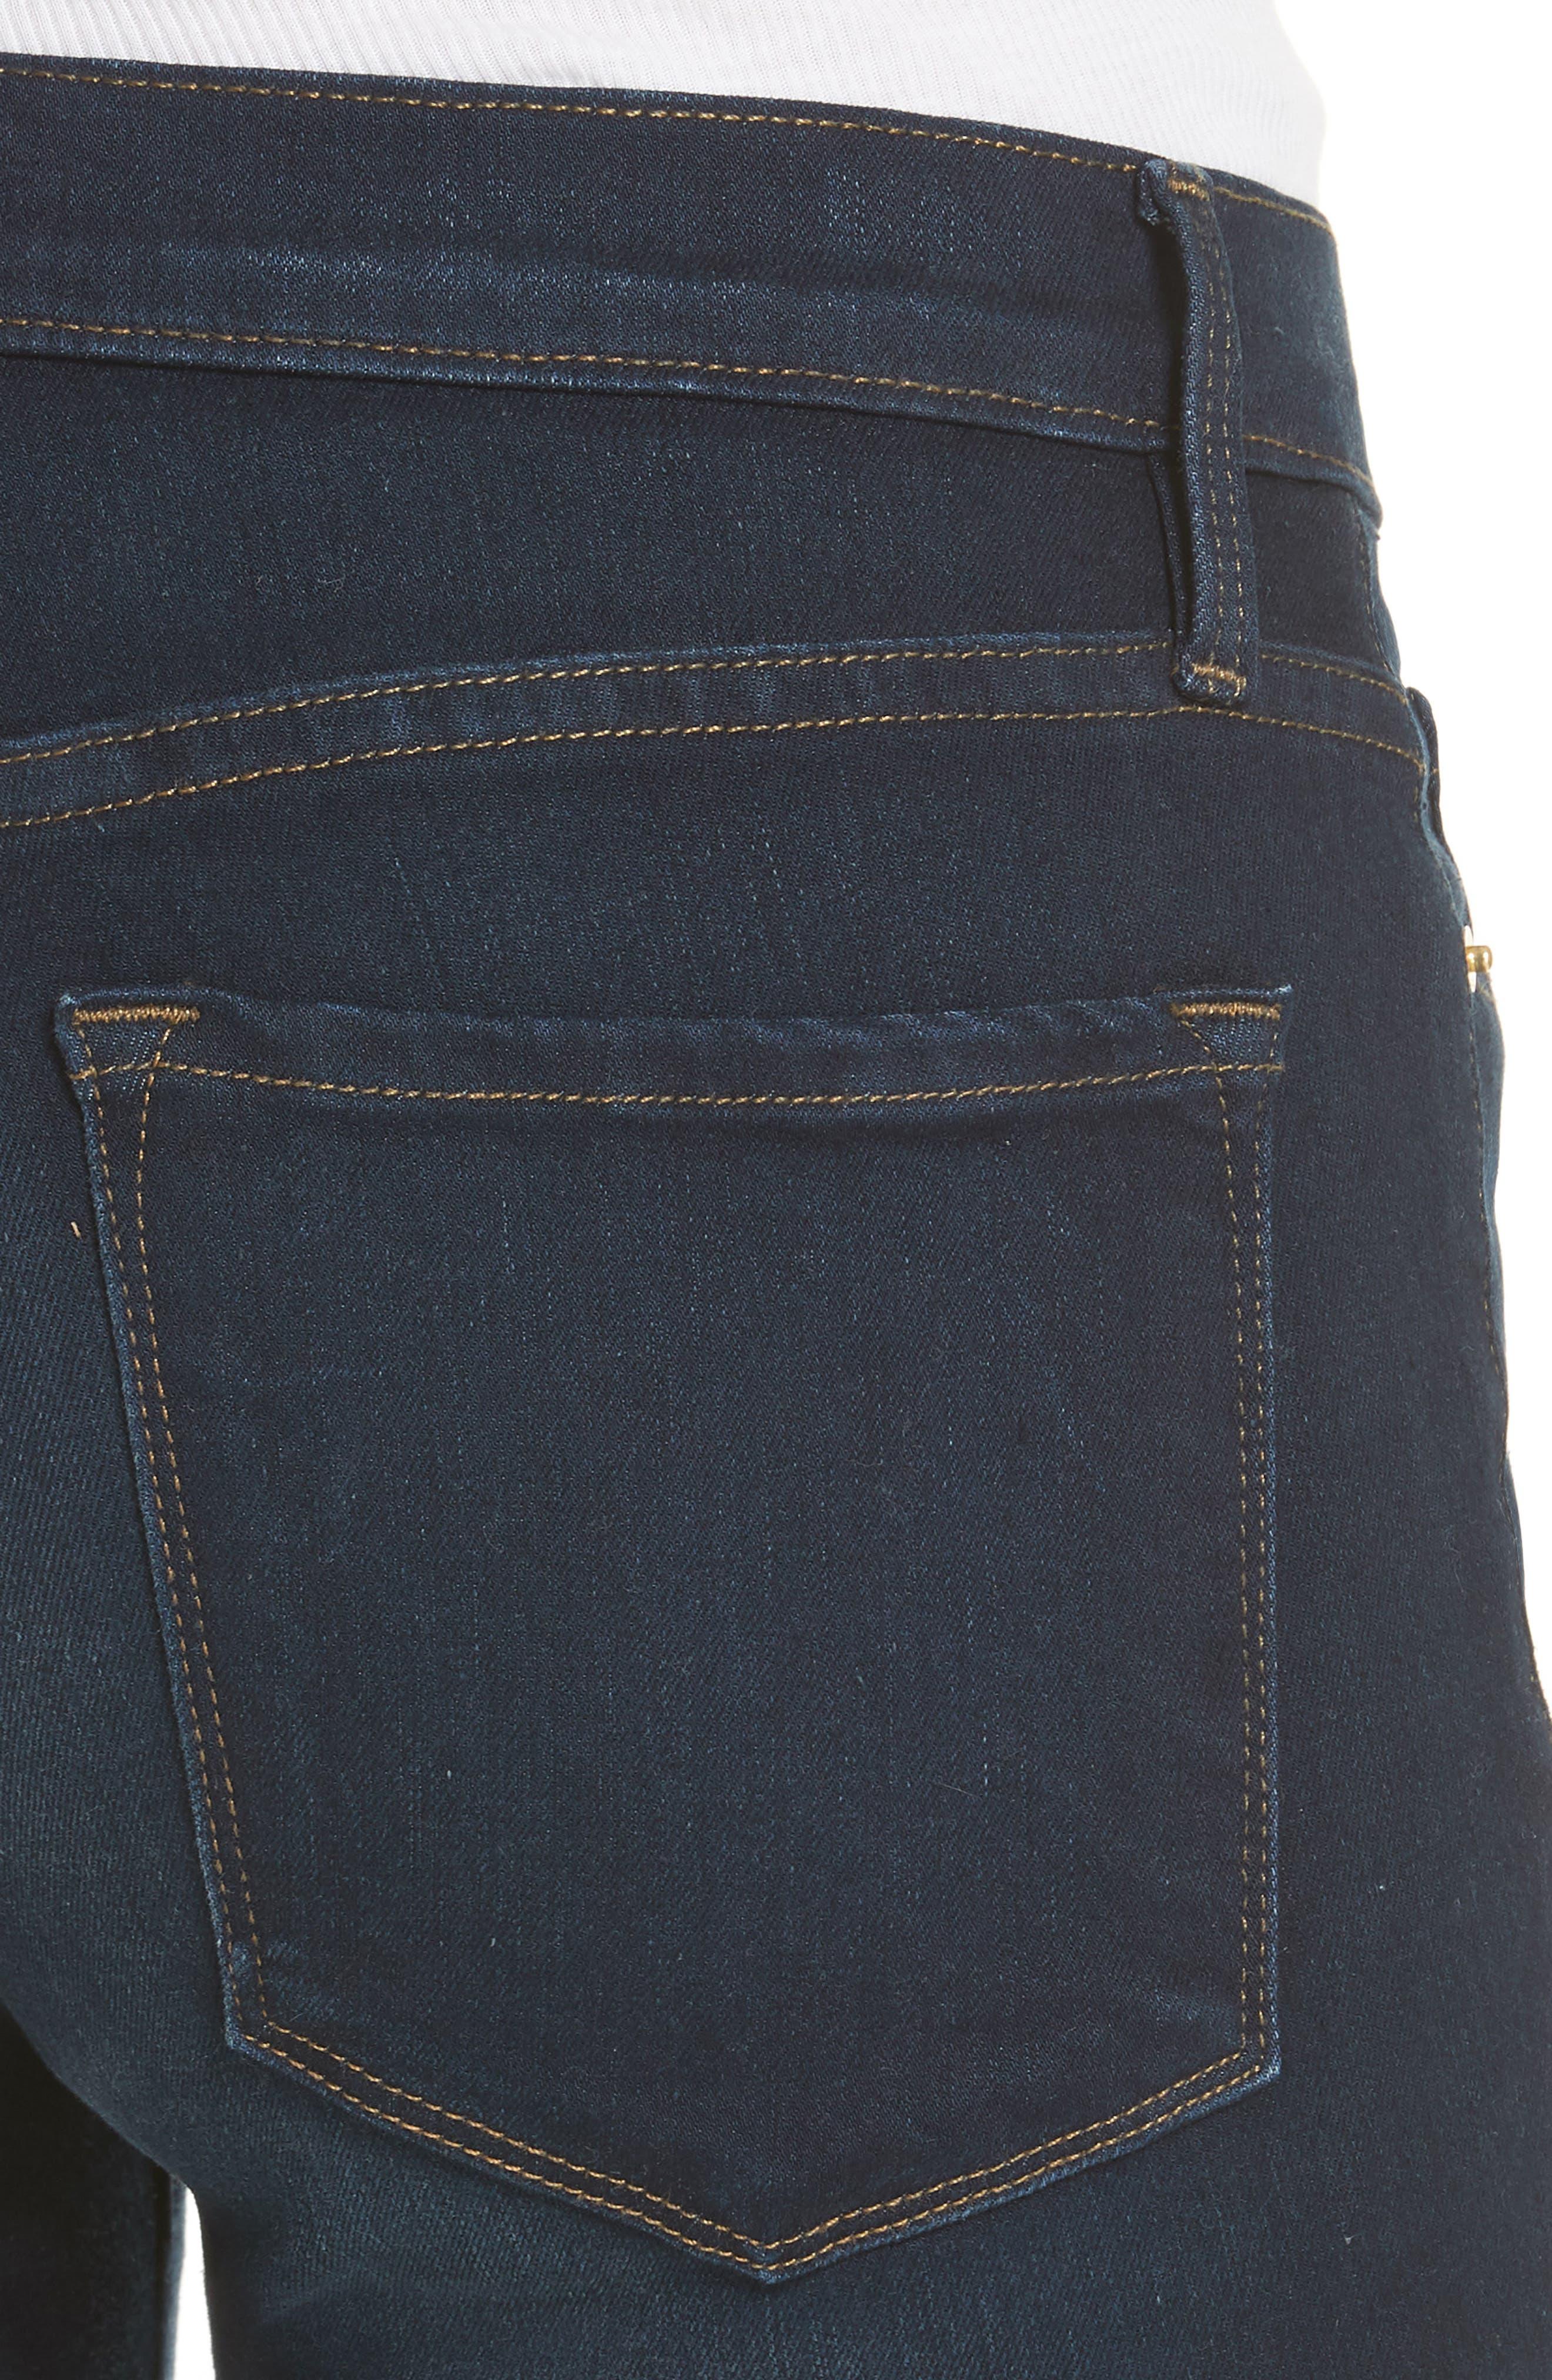 Le Skinny de Jeanne Sweetheart Hem Jeans,                             Alternate thumbnail 4, color,                             Longstreet